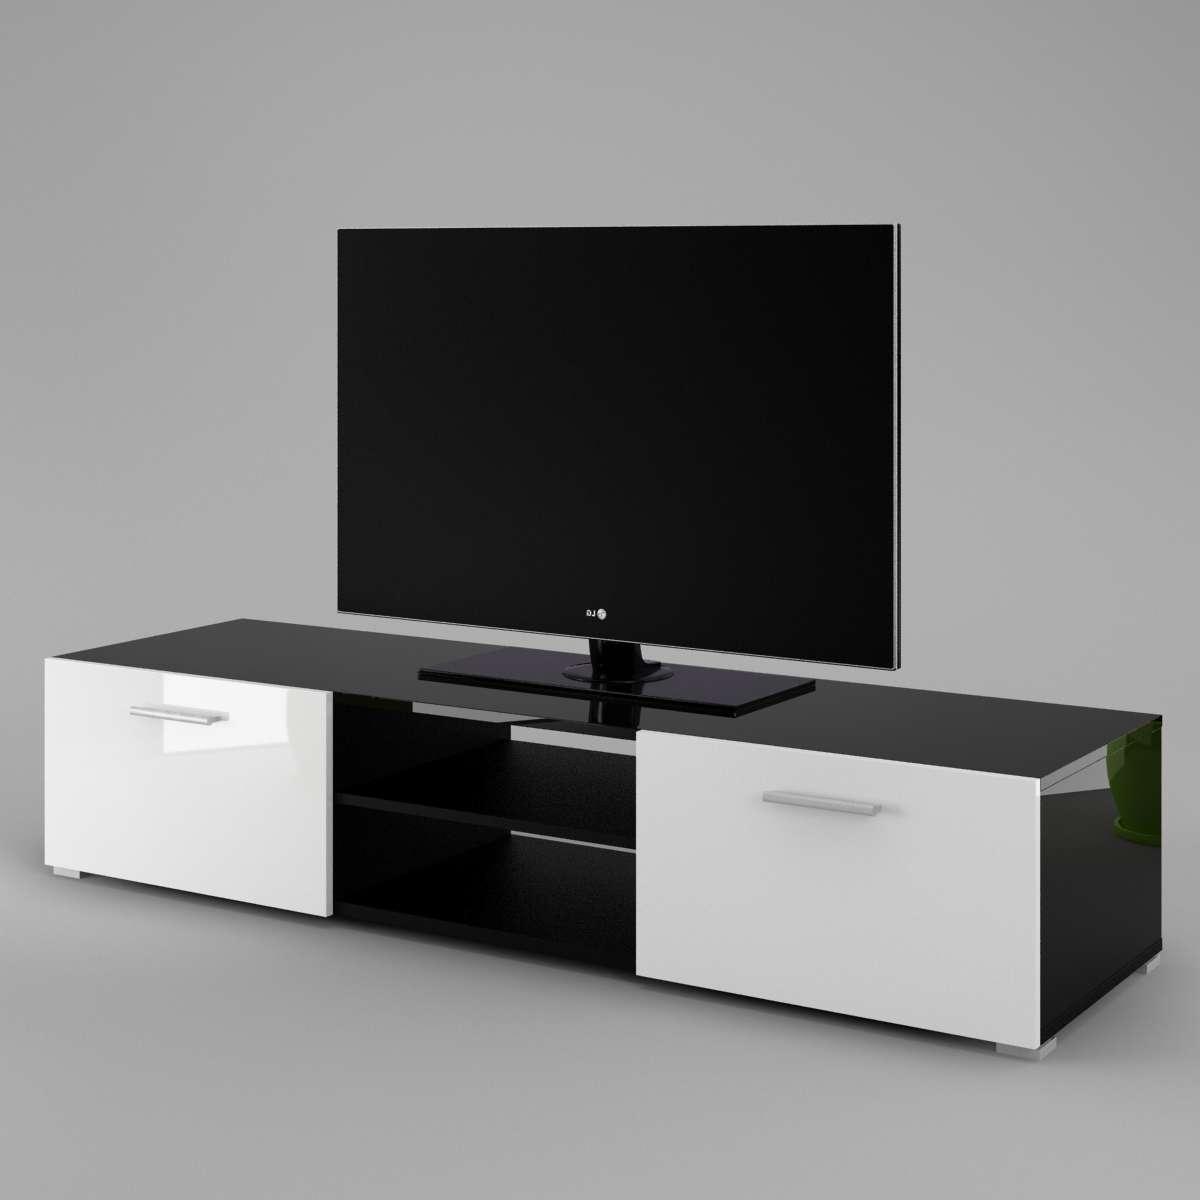 Tv Cabinet Luna – Labi Furniturelabi Furniture Pertaining To High Gloss Tv Cabinets (View 17 of 20)